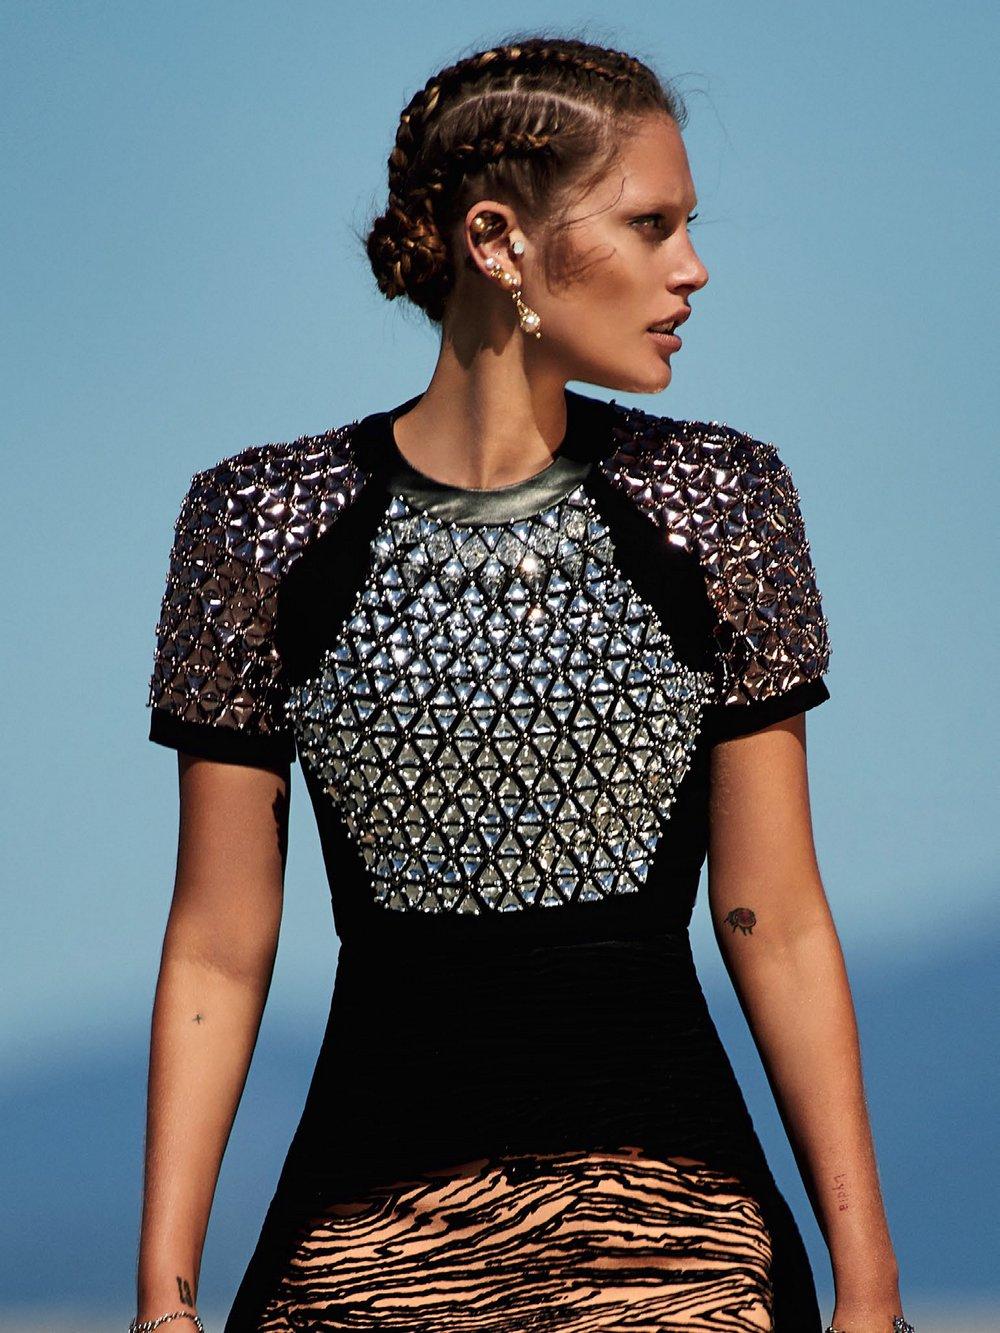 Catherine-McNeil-by-Gilles-Bensimon-for-Vogue-Australia-October-2014-8.jpg